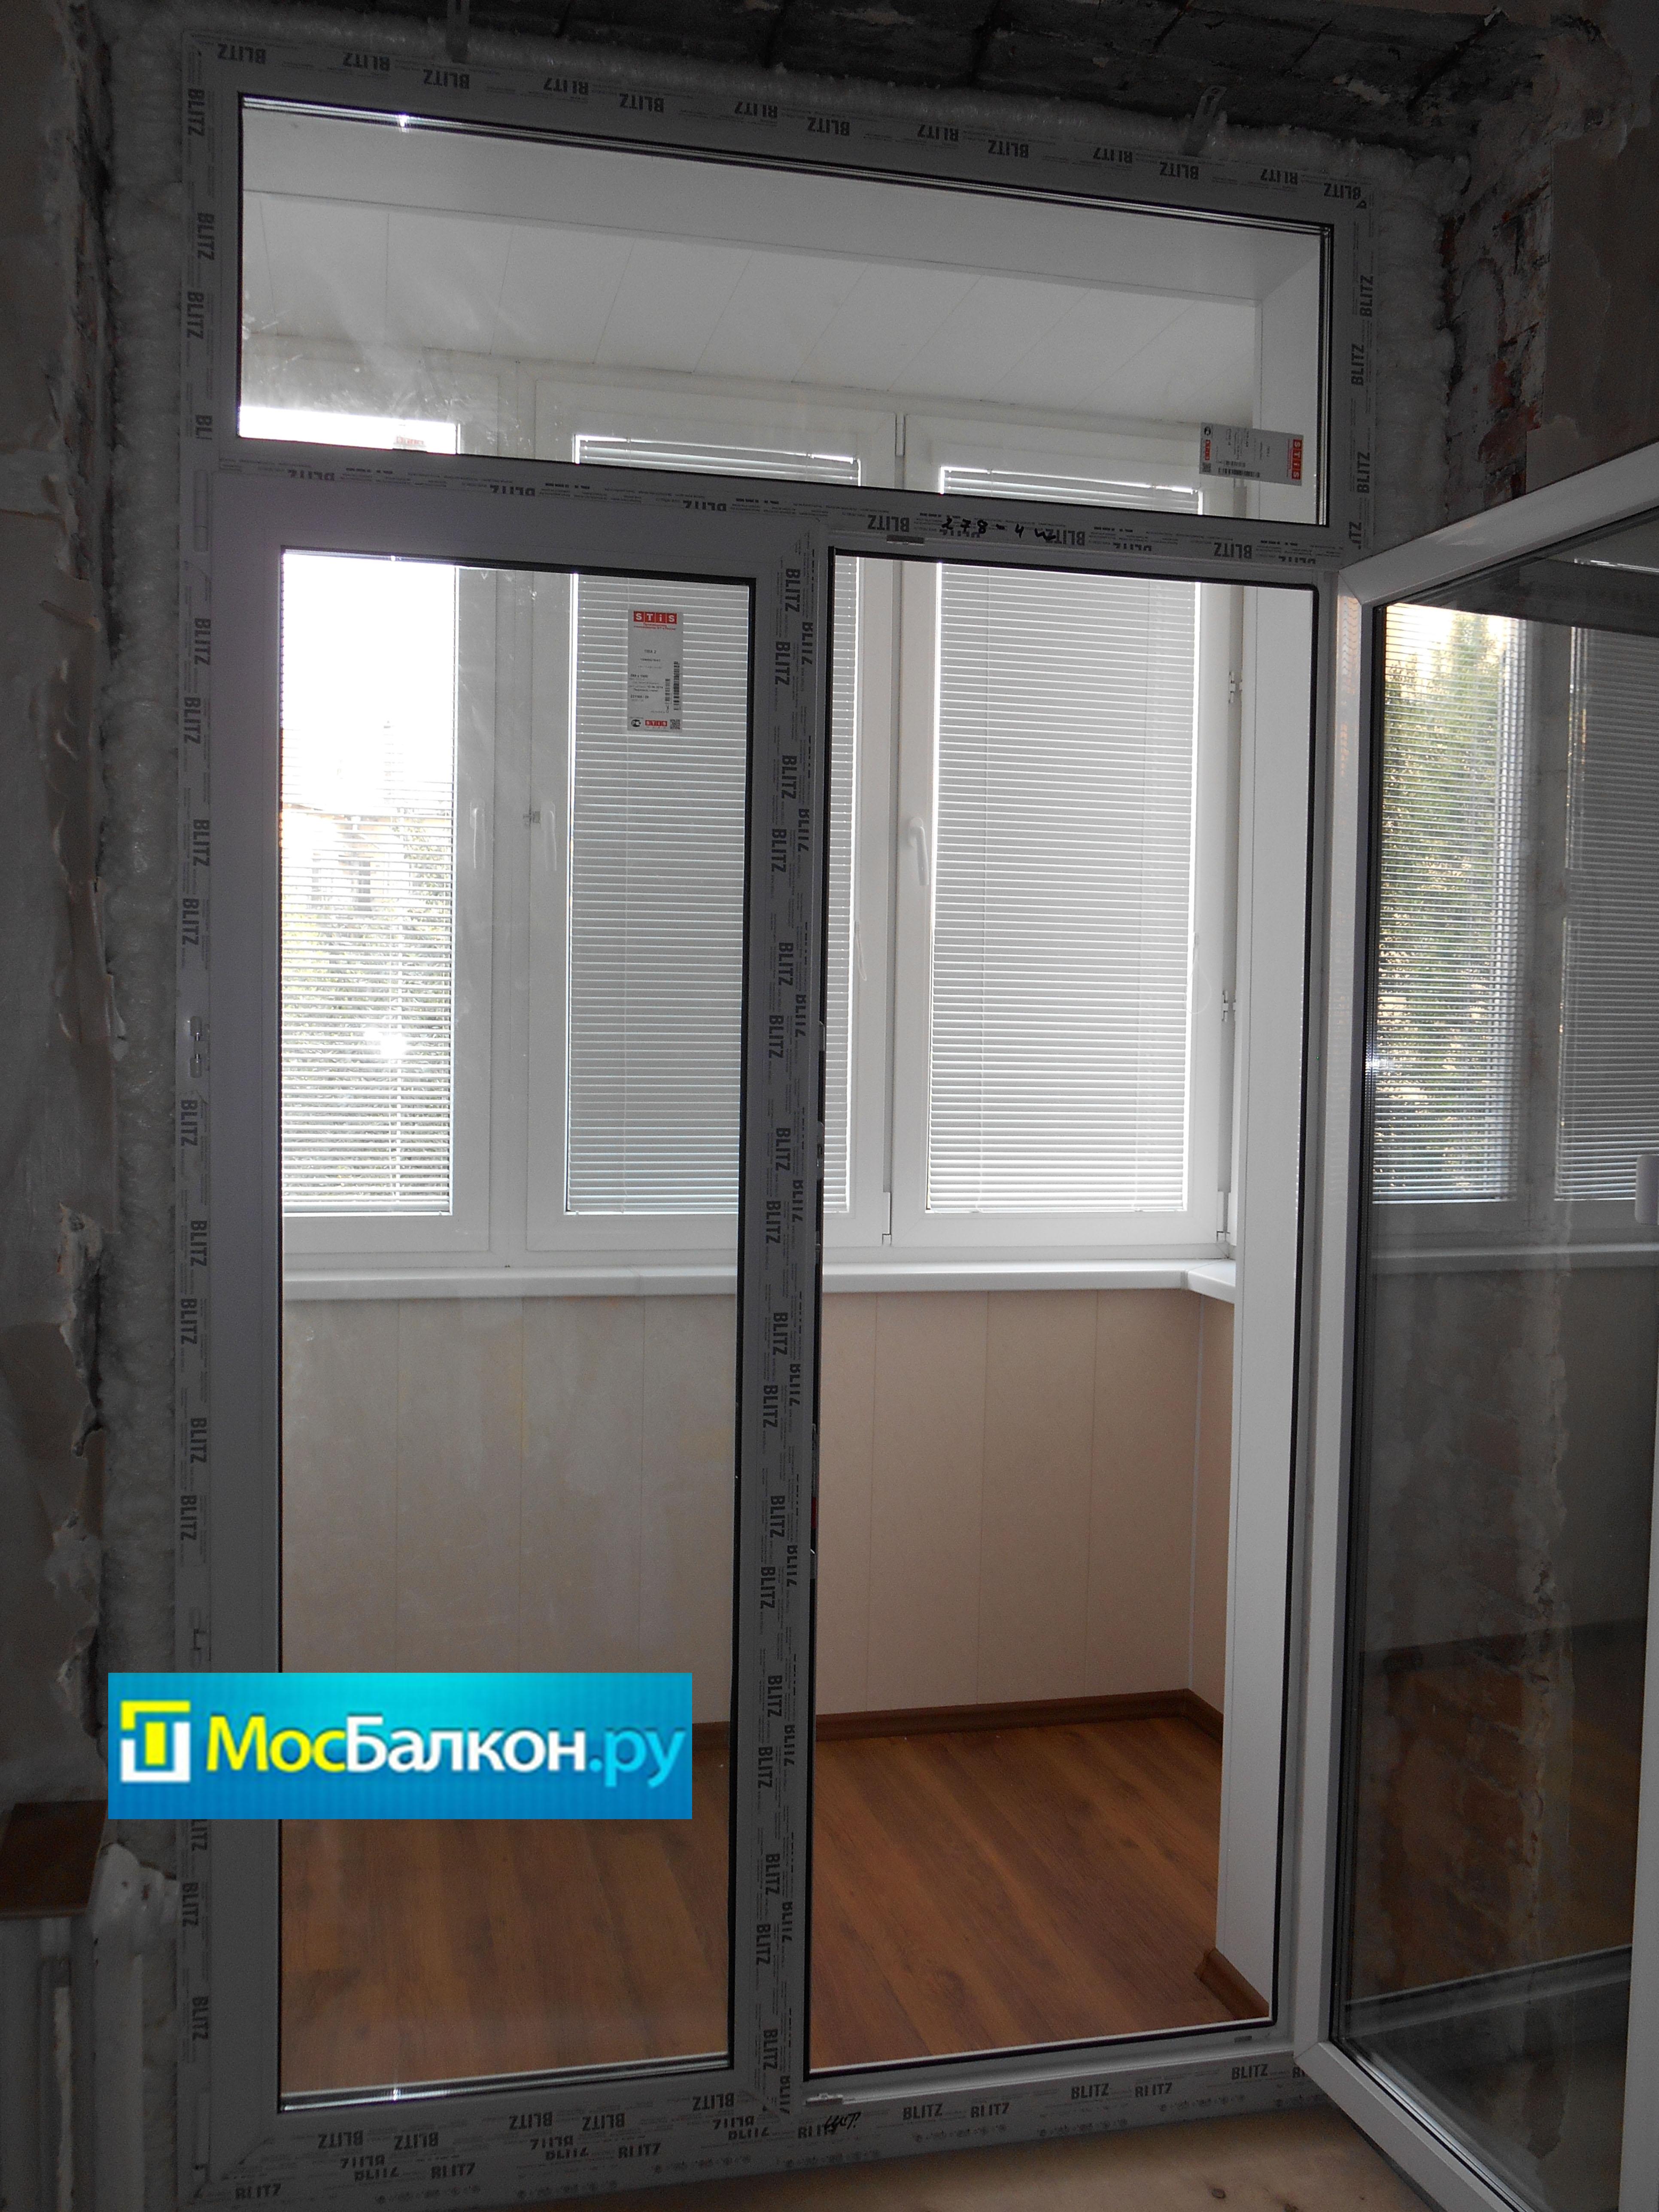 Дверь на балкон rehau (рехау) мосбалкон.ру.